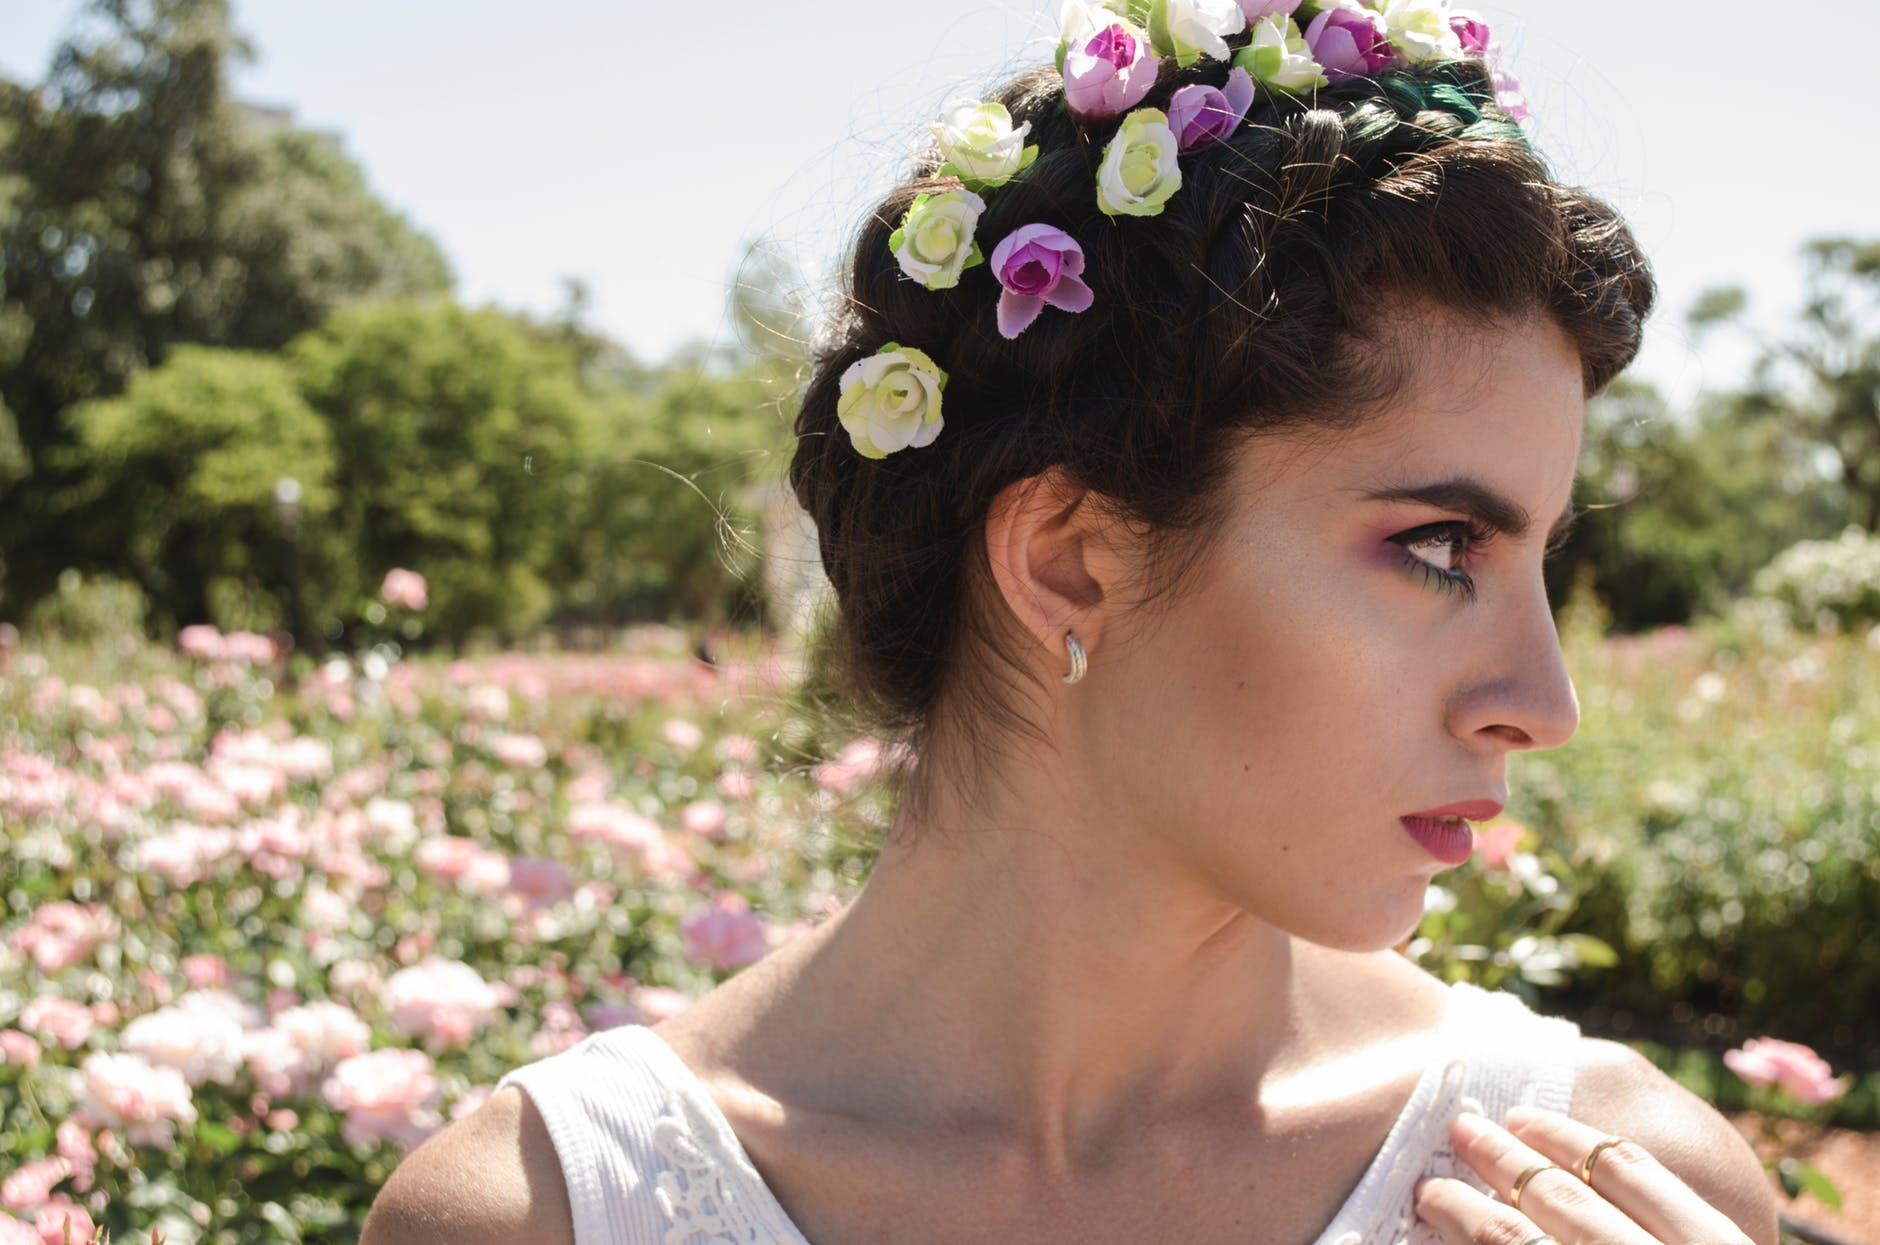 floral-hair-designs-floral-braided-crown-hair-artists-designs-trends